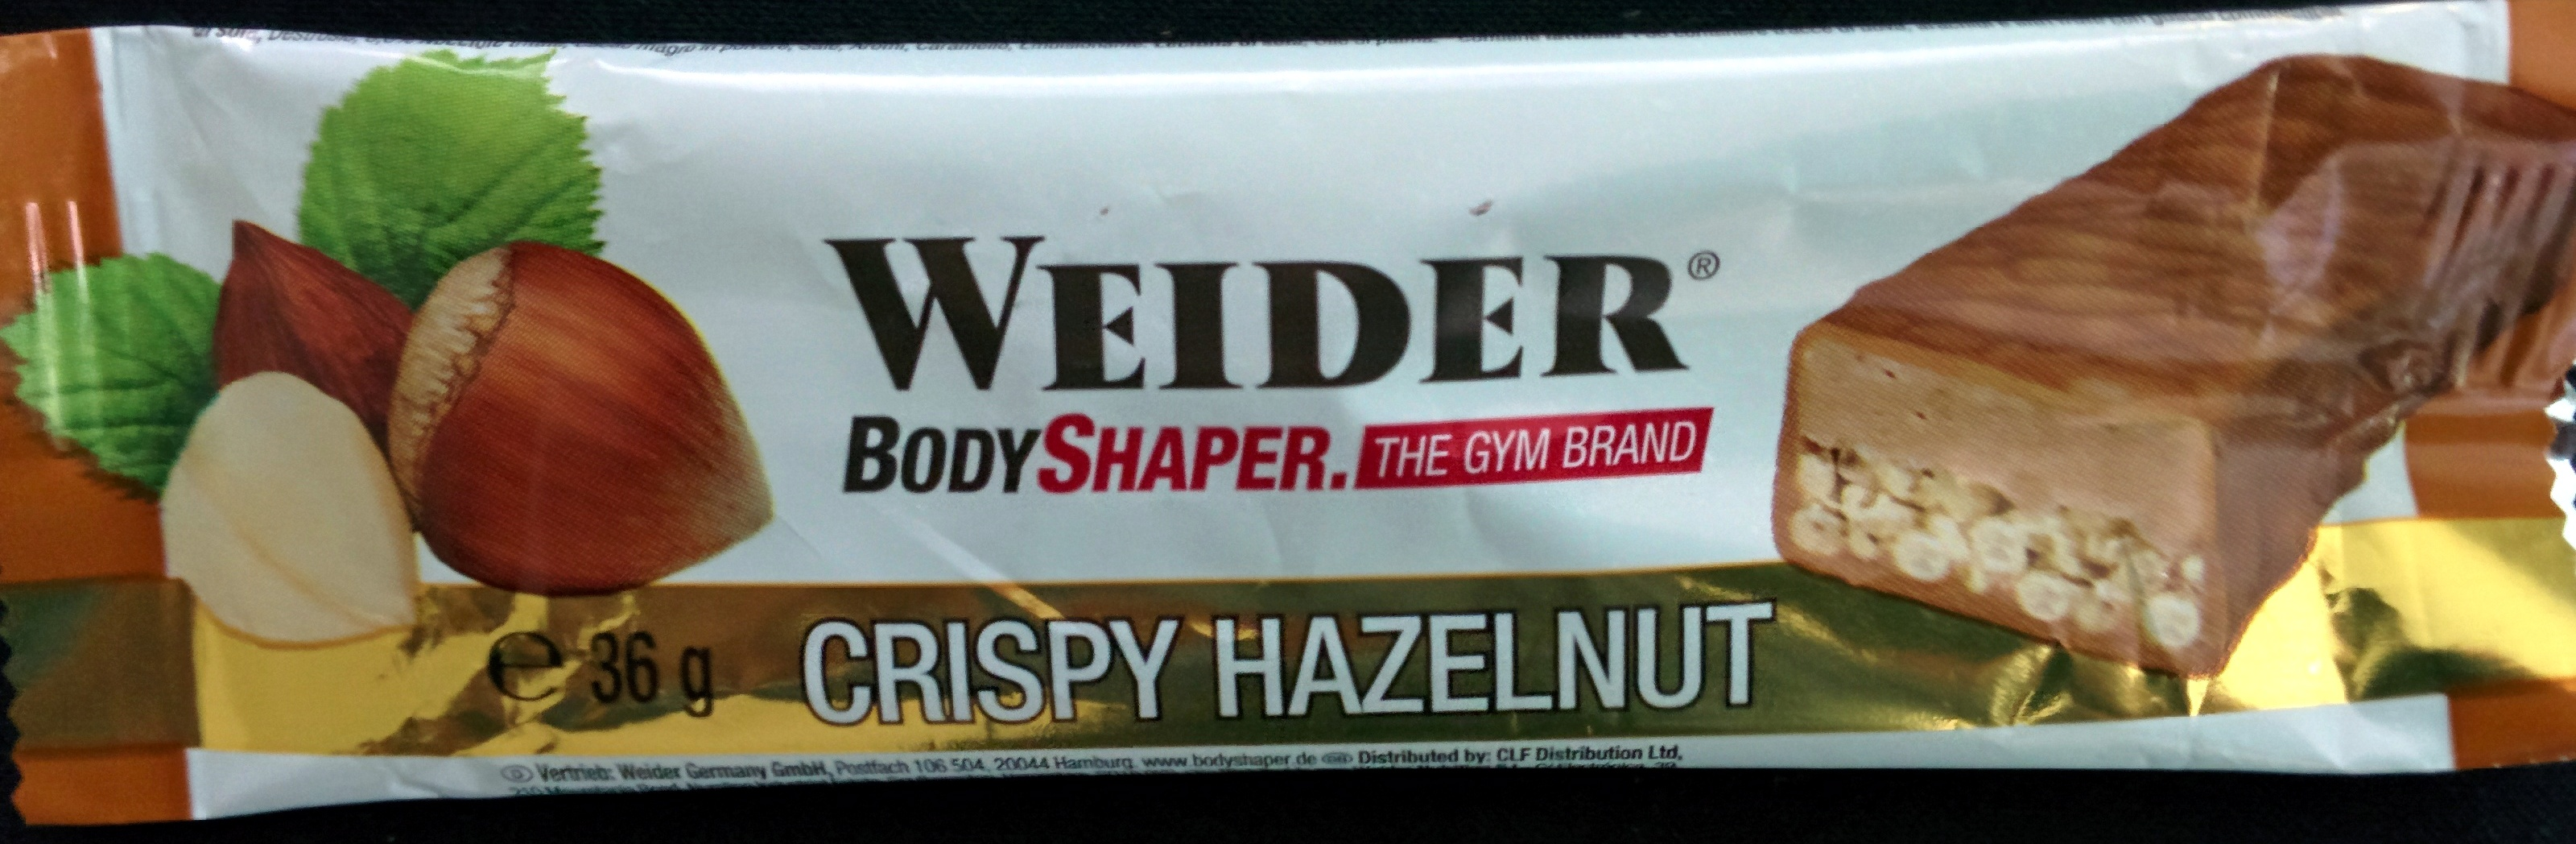 BodyShaper Crispy Hazelnut - Product - de